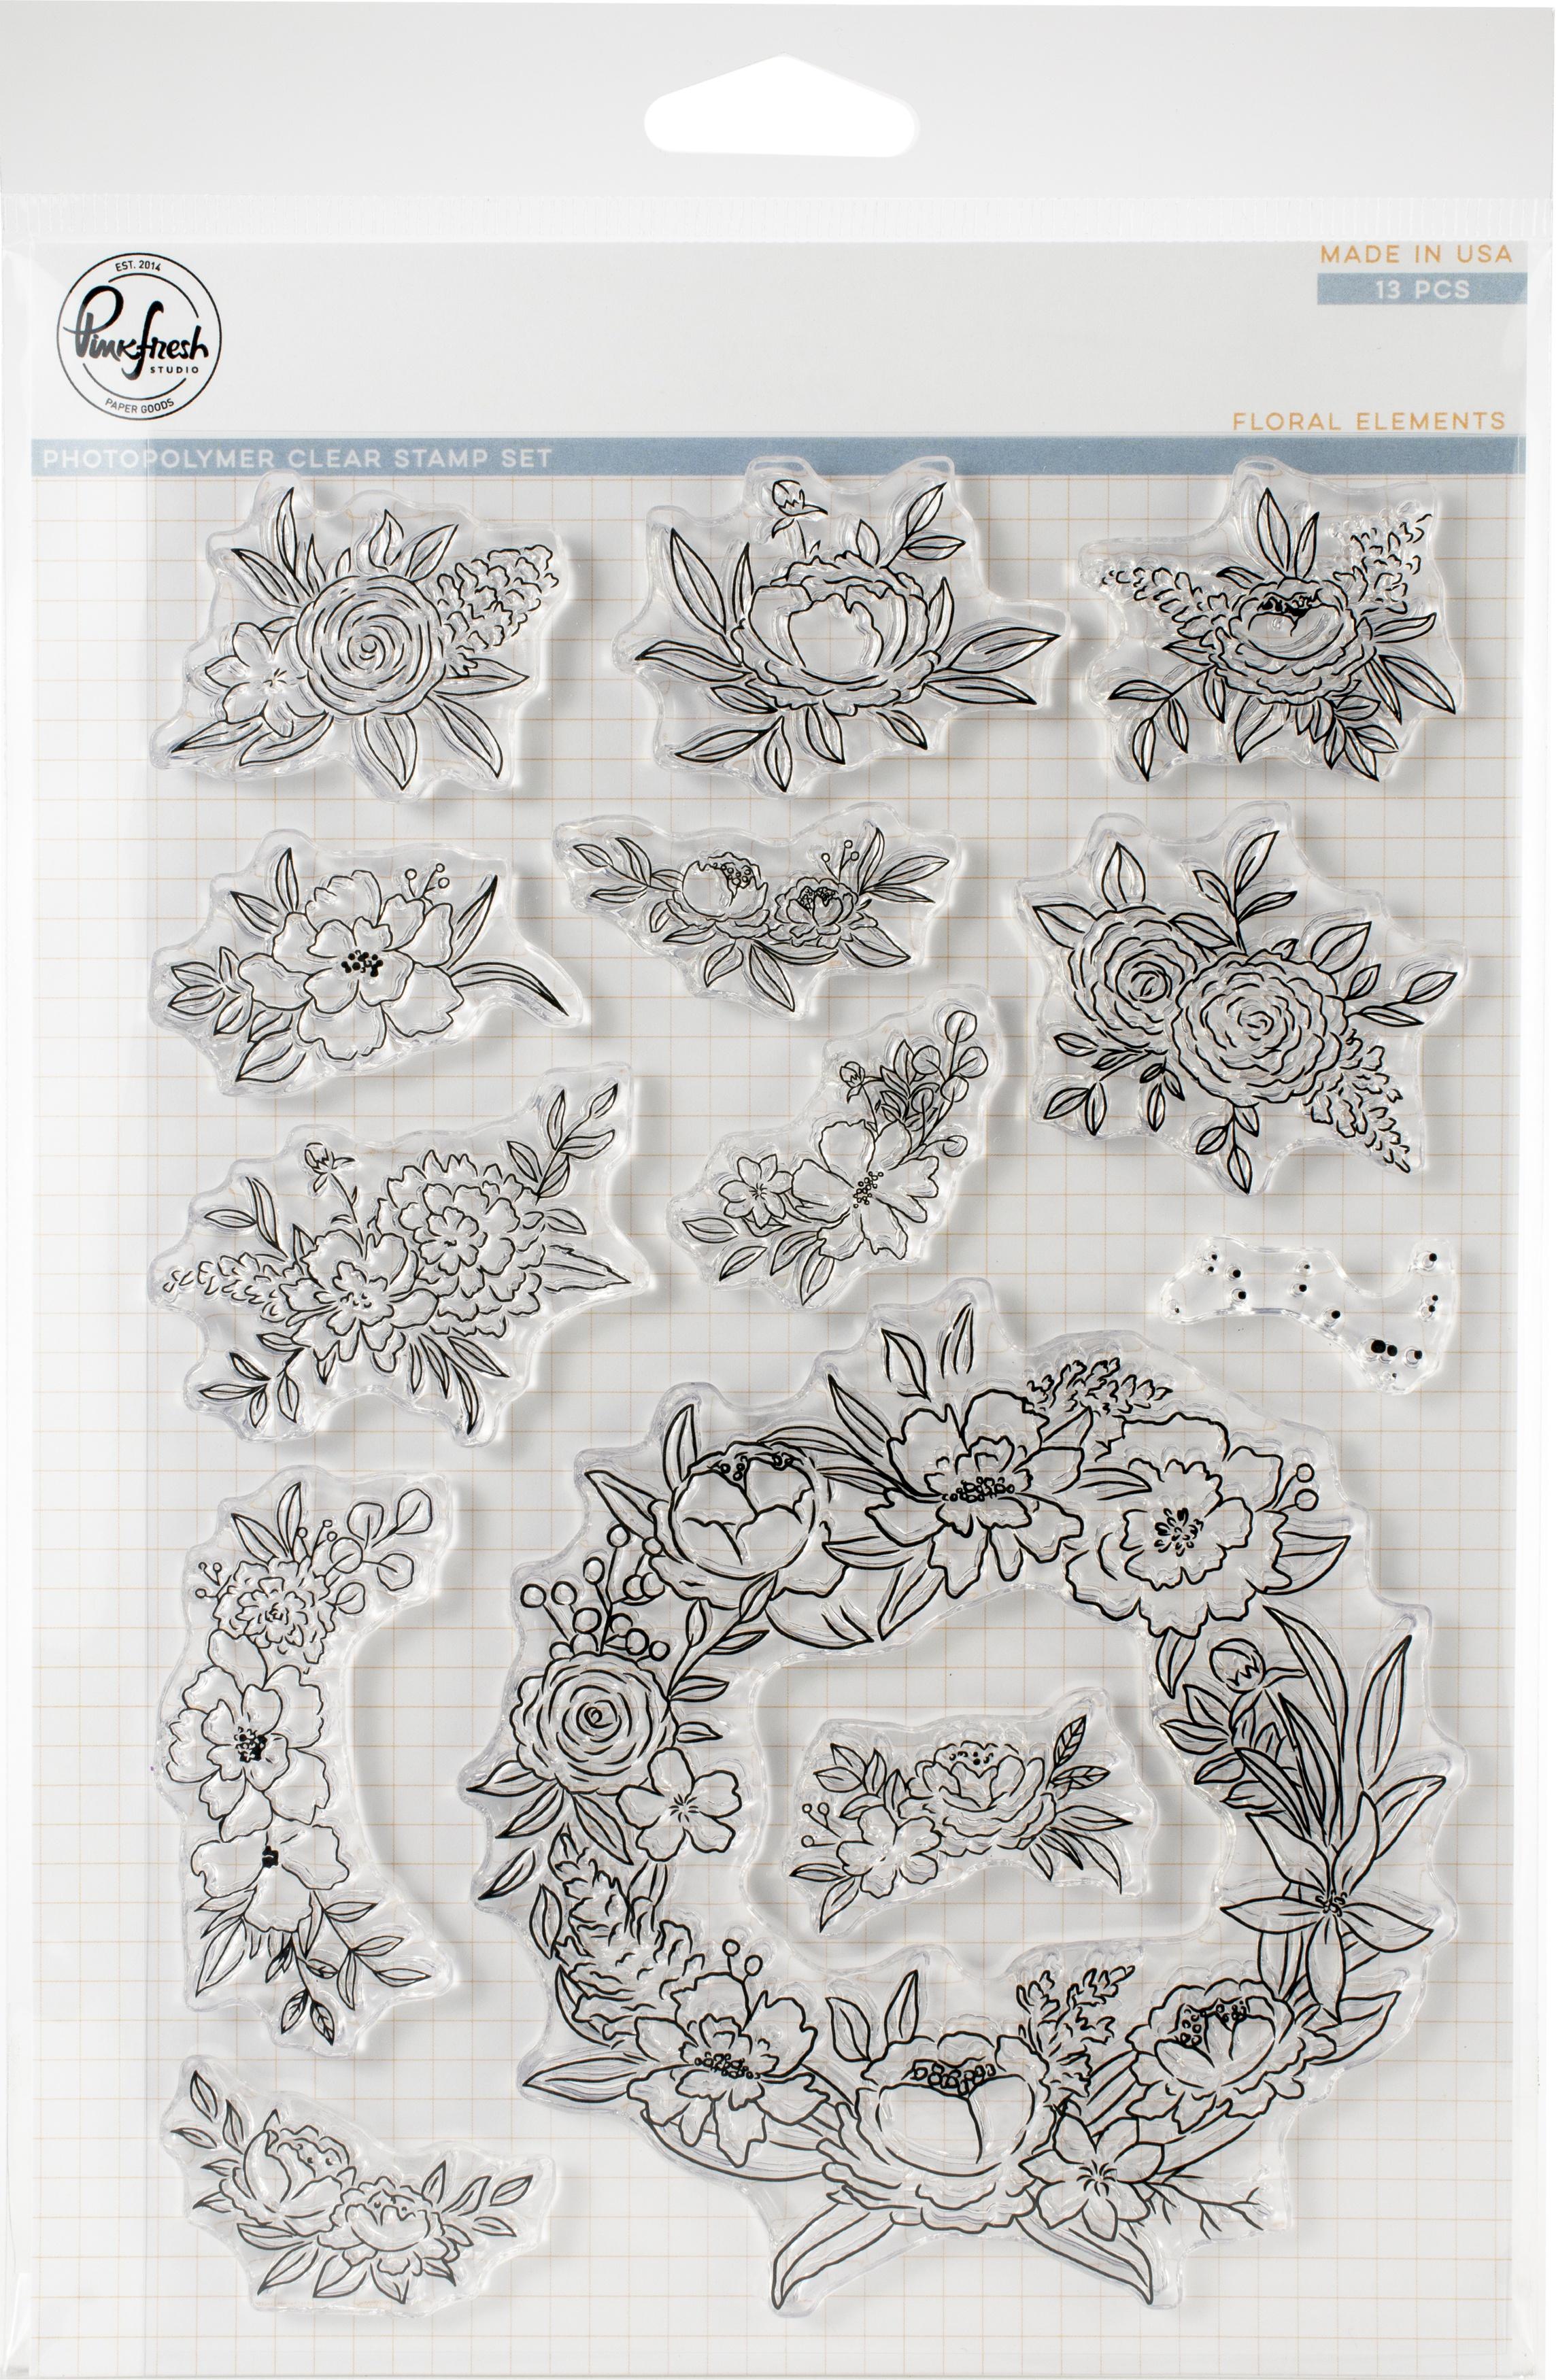 Pinkfresh Studio Clear Stamp Set 6X8-Floral Elements